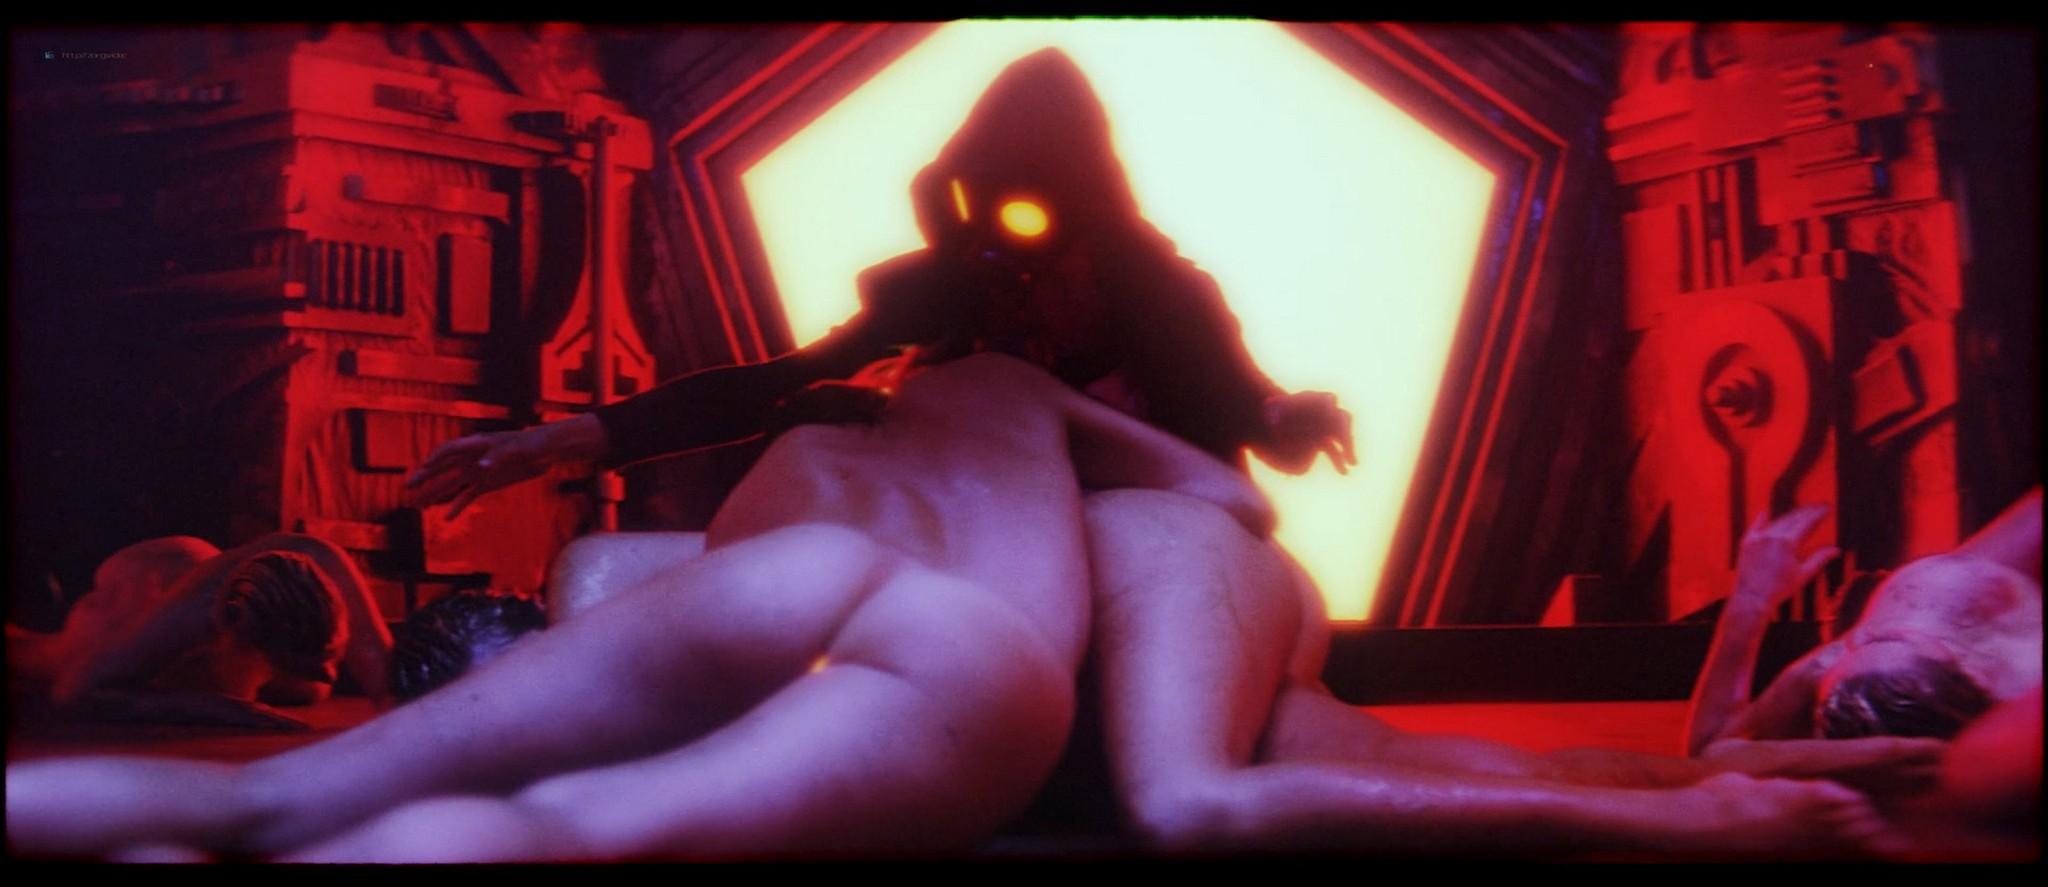 Blood nude